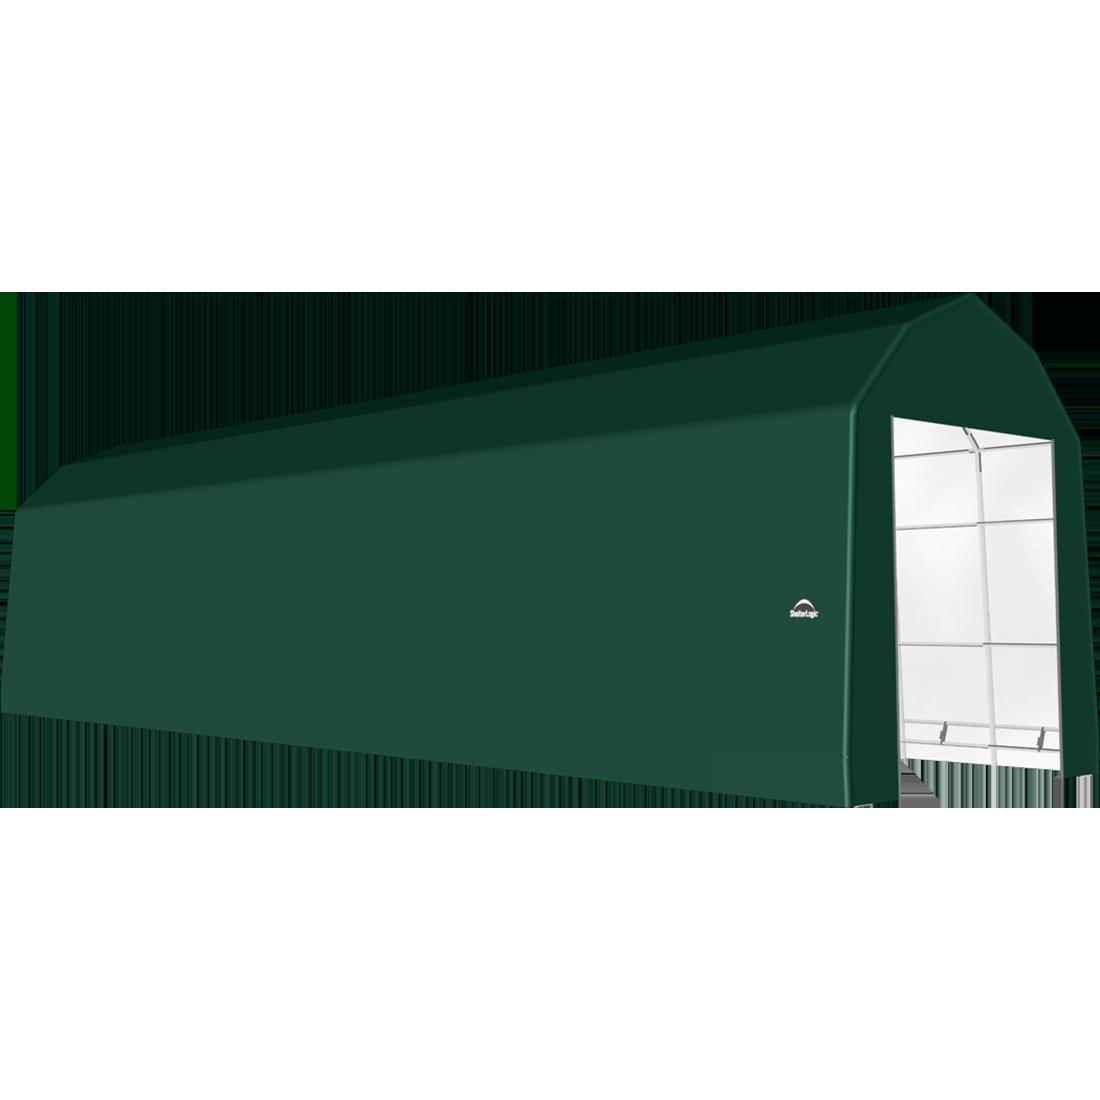 ShelterTech SP Series Barn Shelter, 15 ft. x 52 ft. x 17 ft. Heavy Duty PVC 14.5 oz. Green